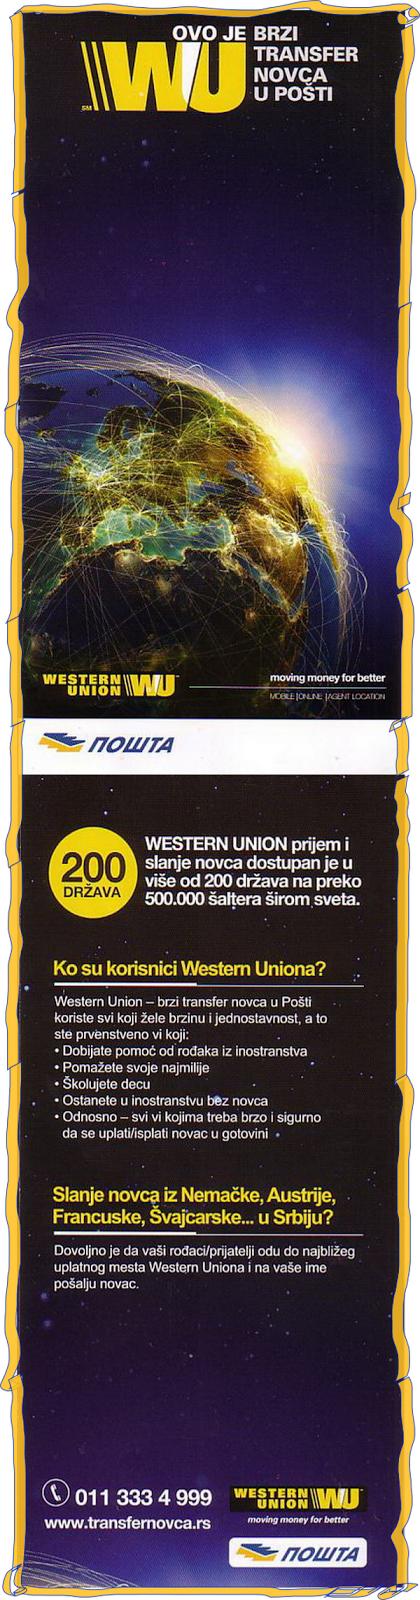 WESTERN UNION  - Брзи трансфер новца